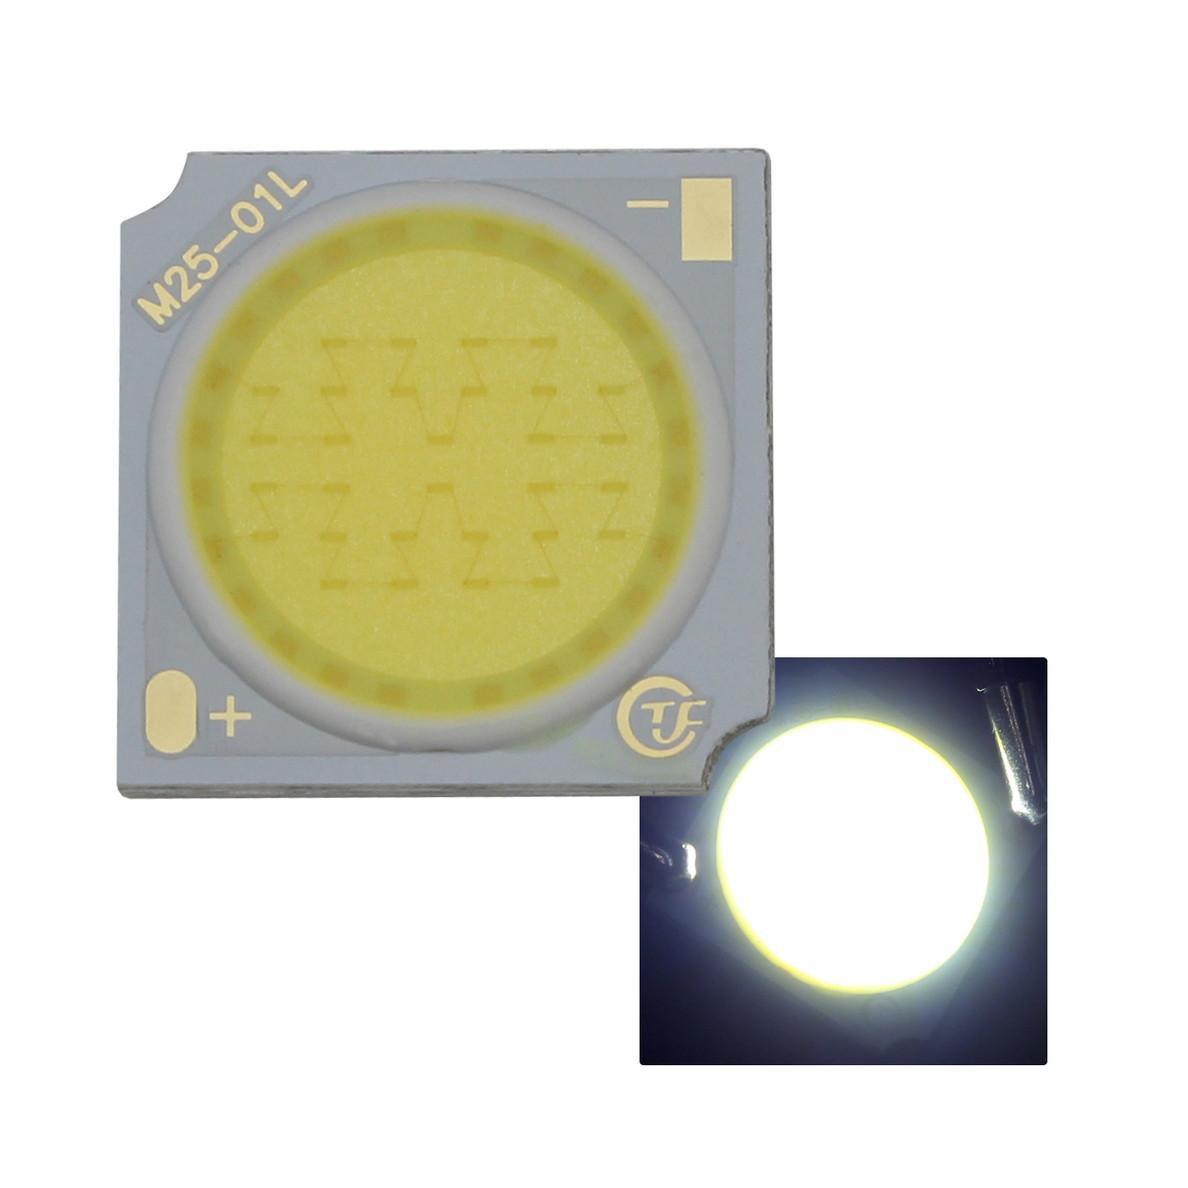 8442(1個) COB 1919 15W LEDモジュール 白色 45-51V 320mA 6000-6500K 110-120lm 80Ra